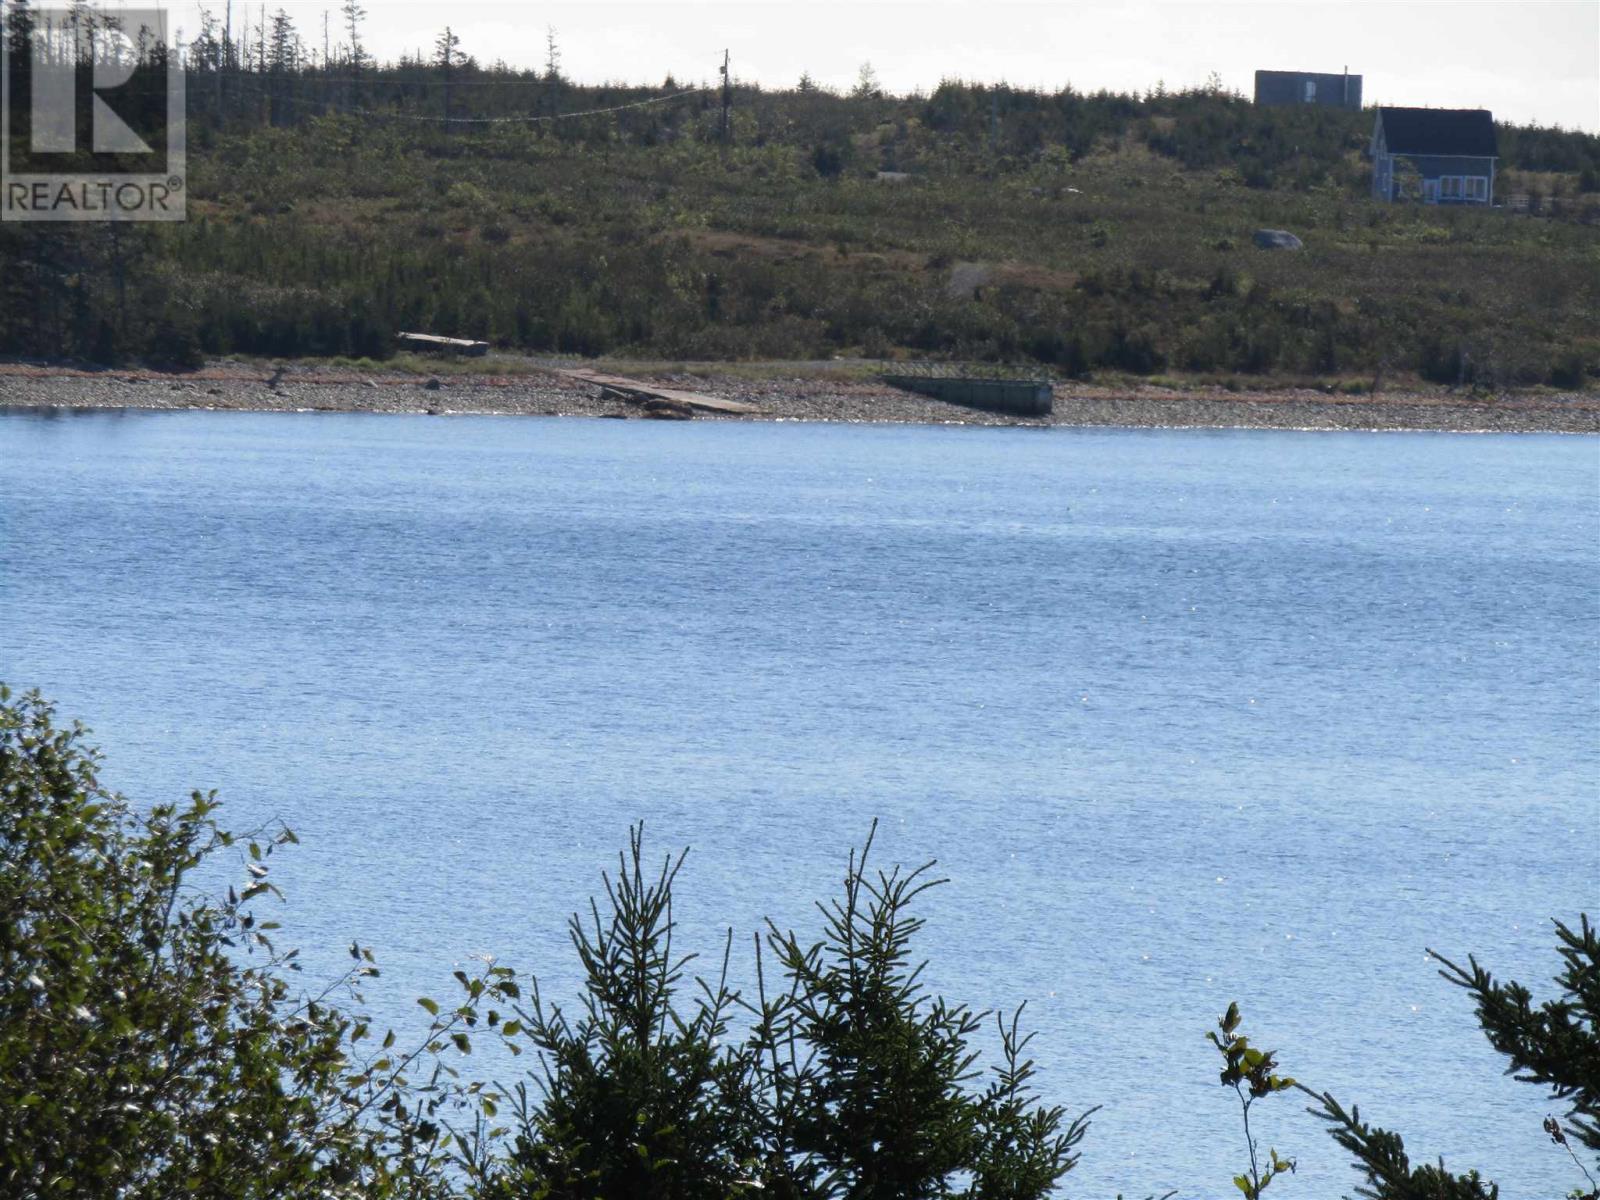 19210 Highway 7, Spry Harbour, Nova Scotia  B2R 1S2 - Photo 1 - 202102577